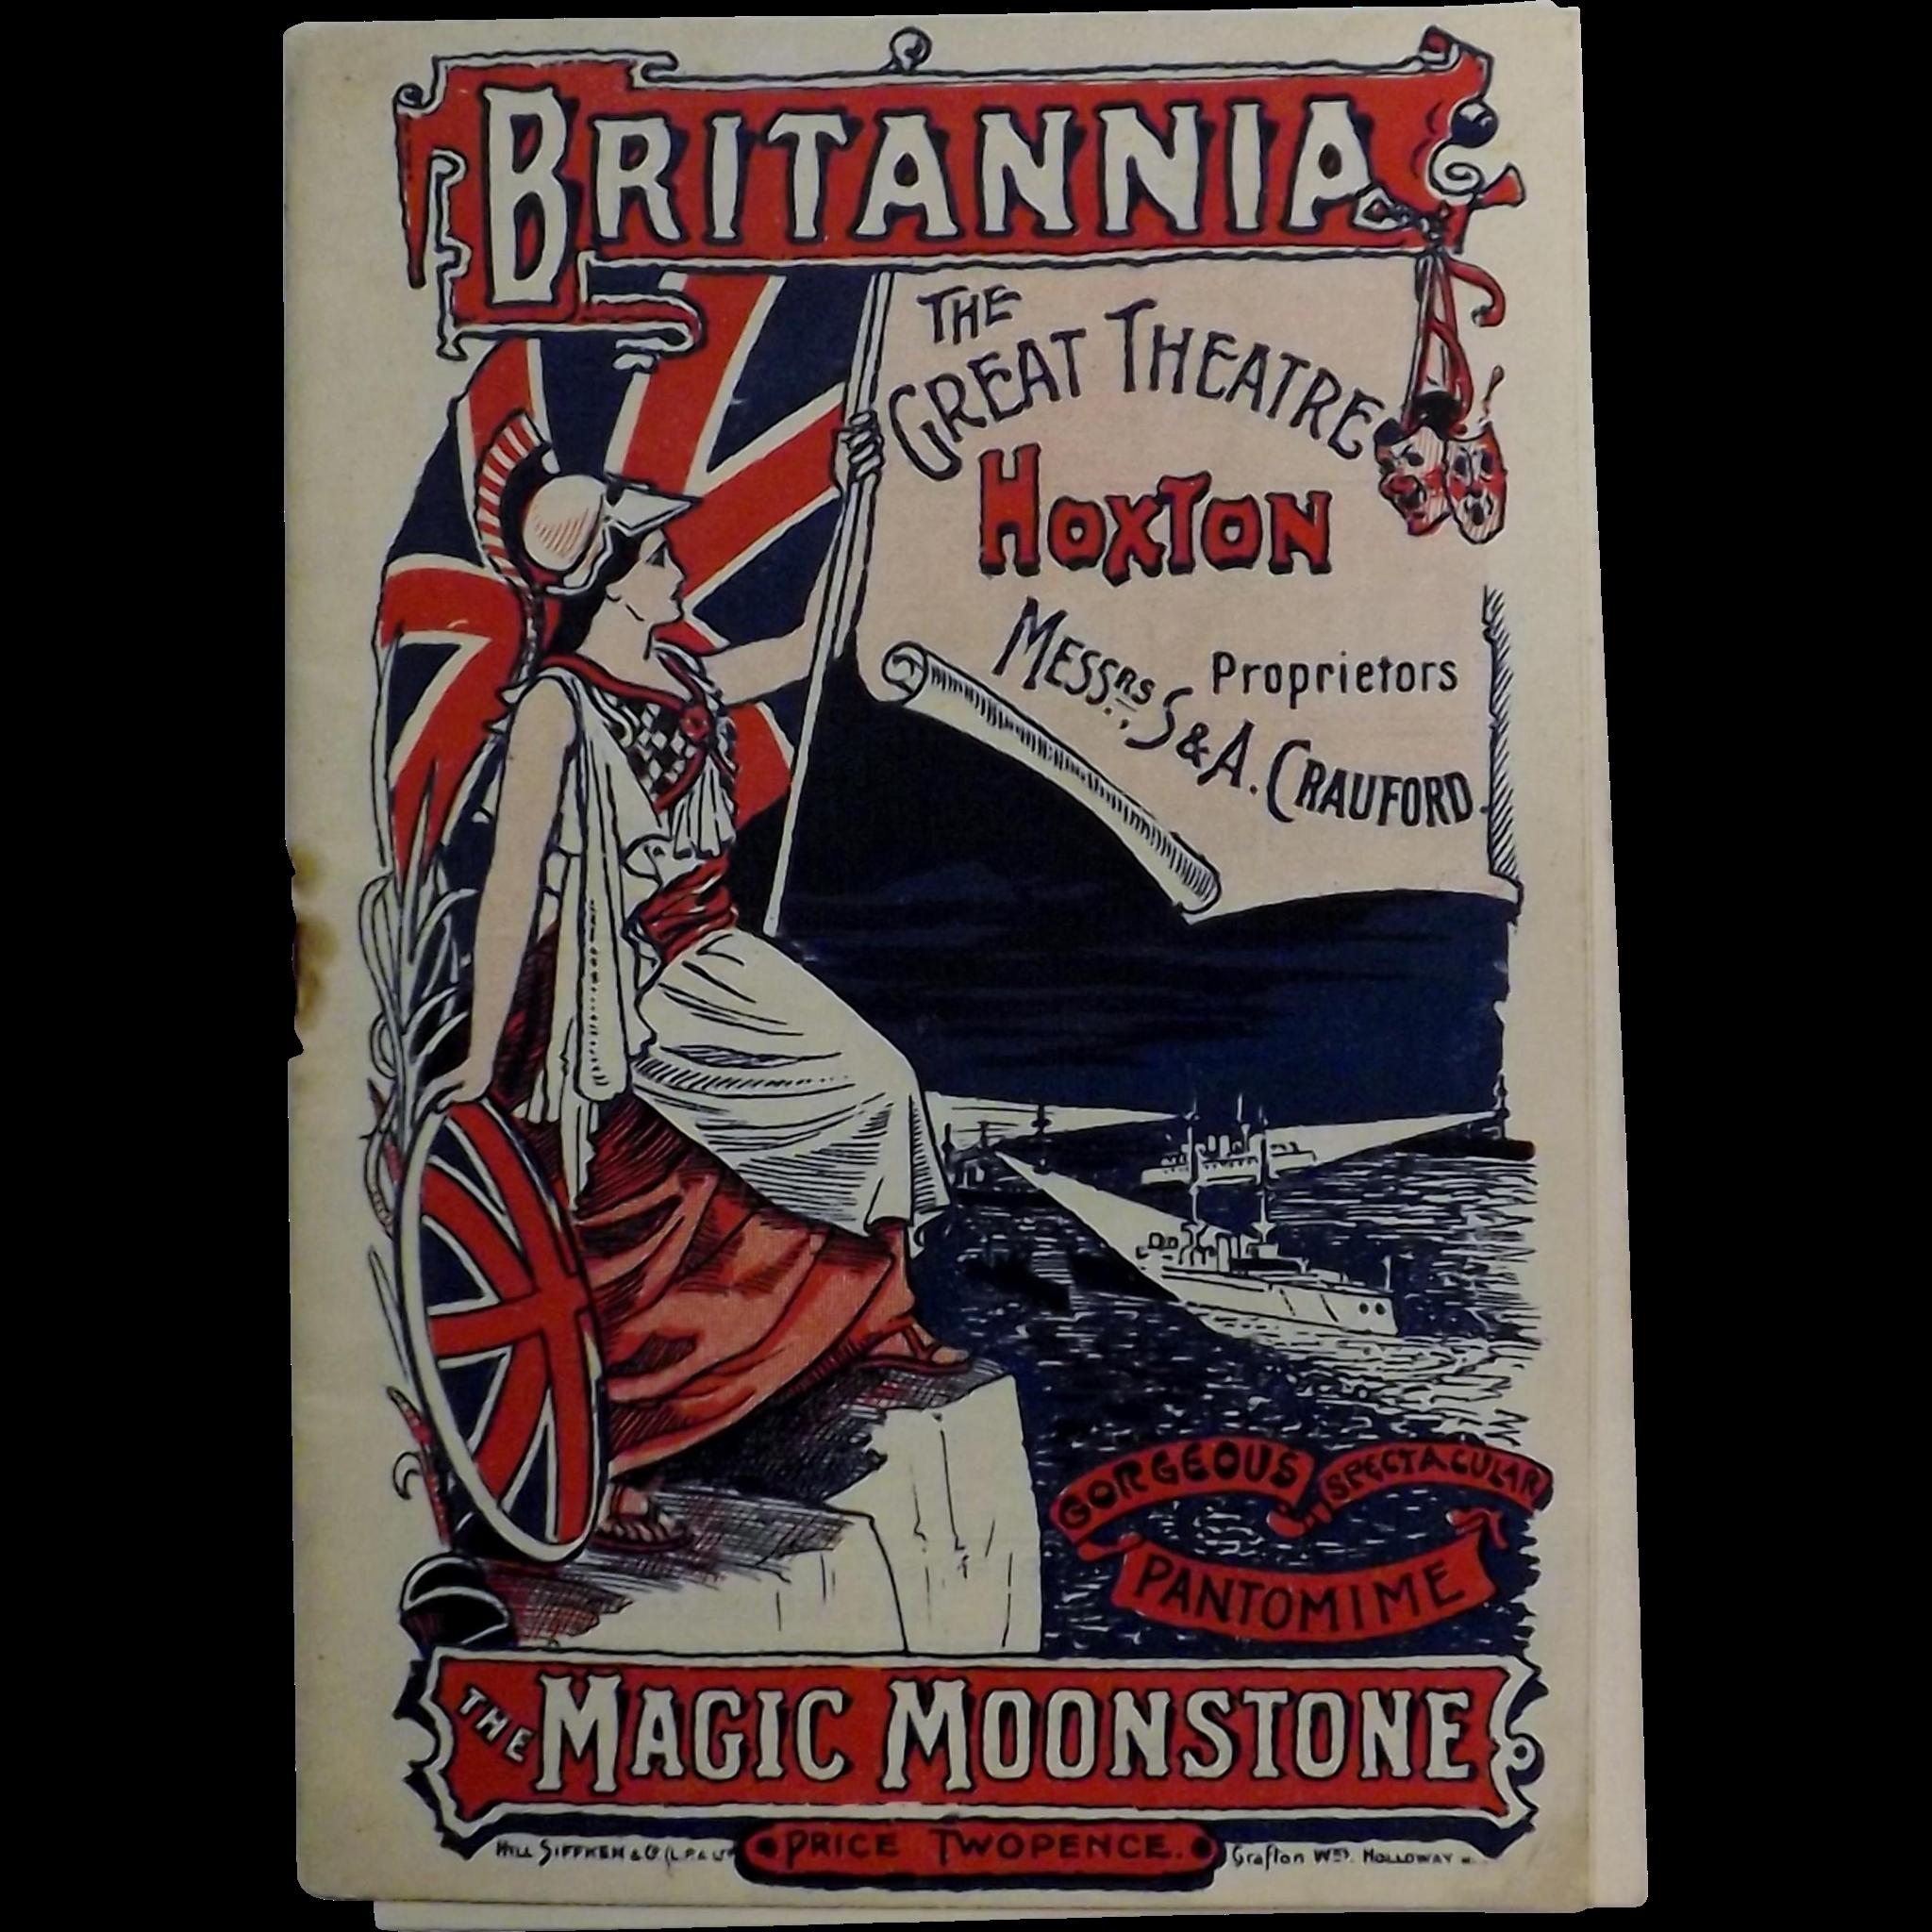 Britannia Theatre, Hoxton, Theatre Programme - London 1899